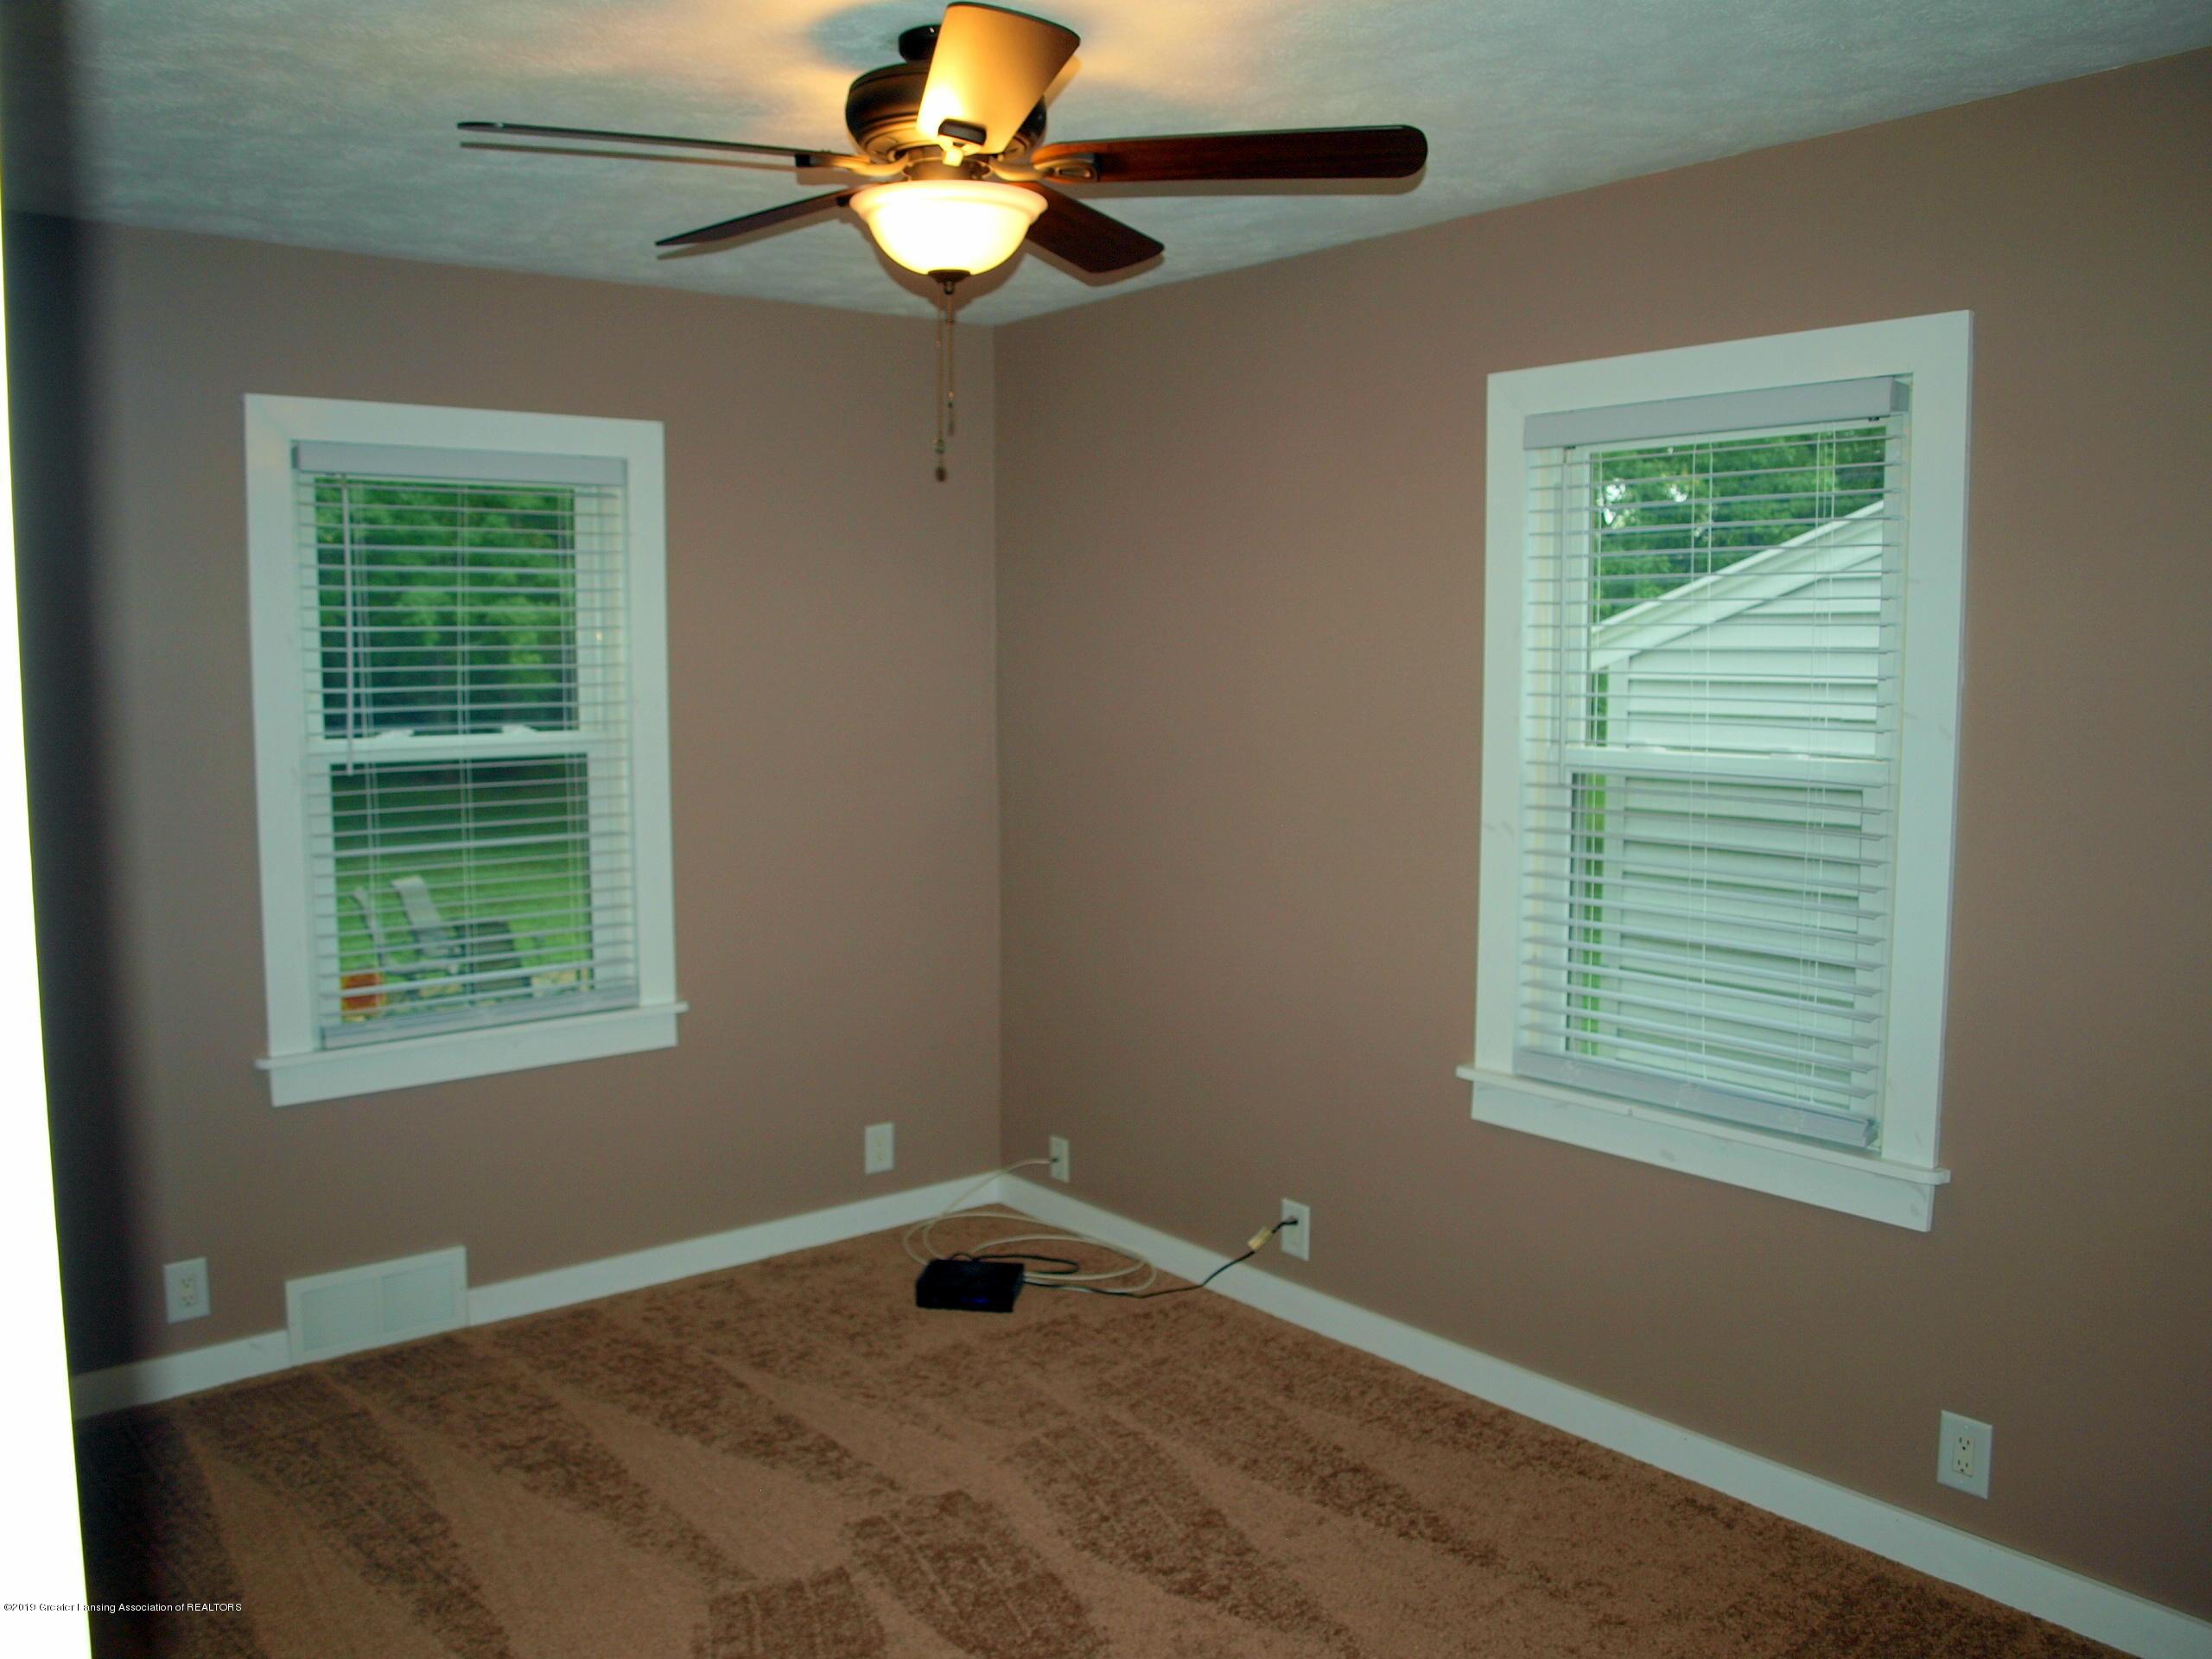 6070 E Clark Rd - 3rd bedroom - 23